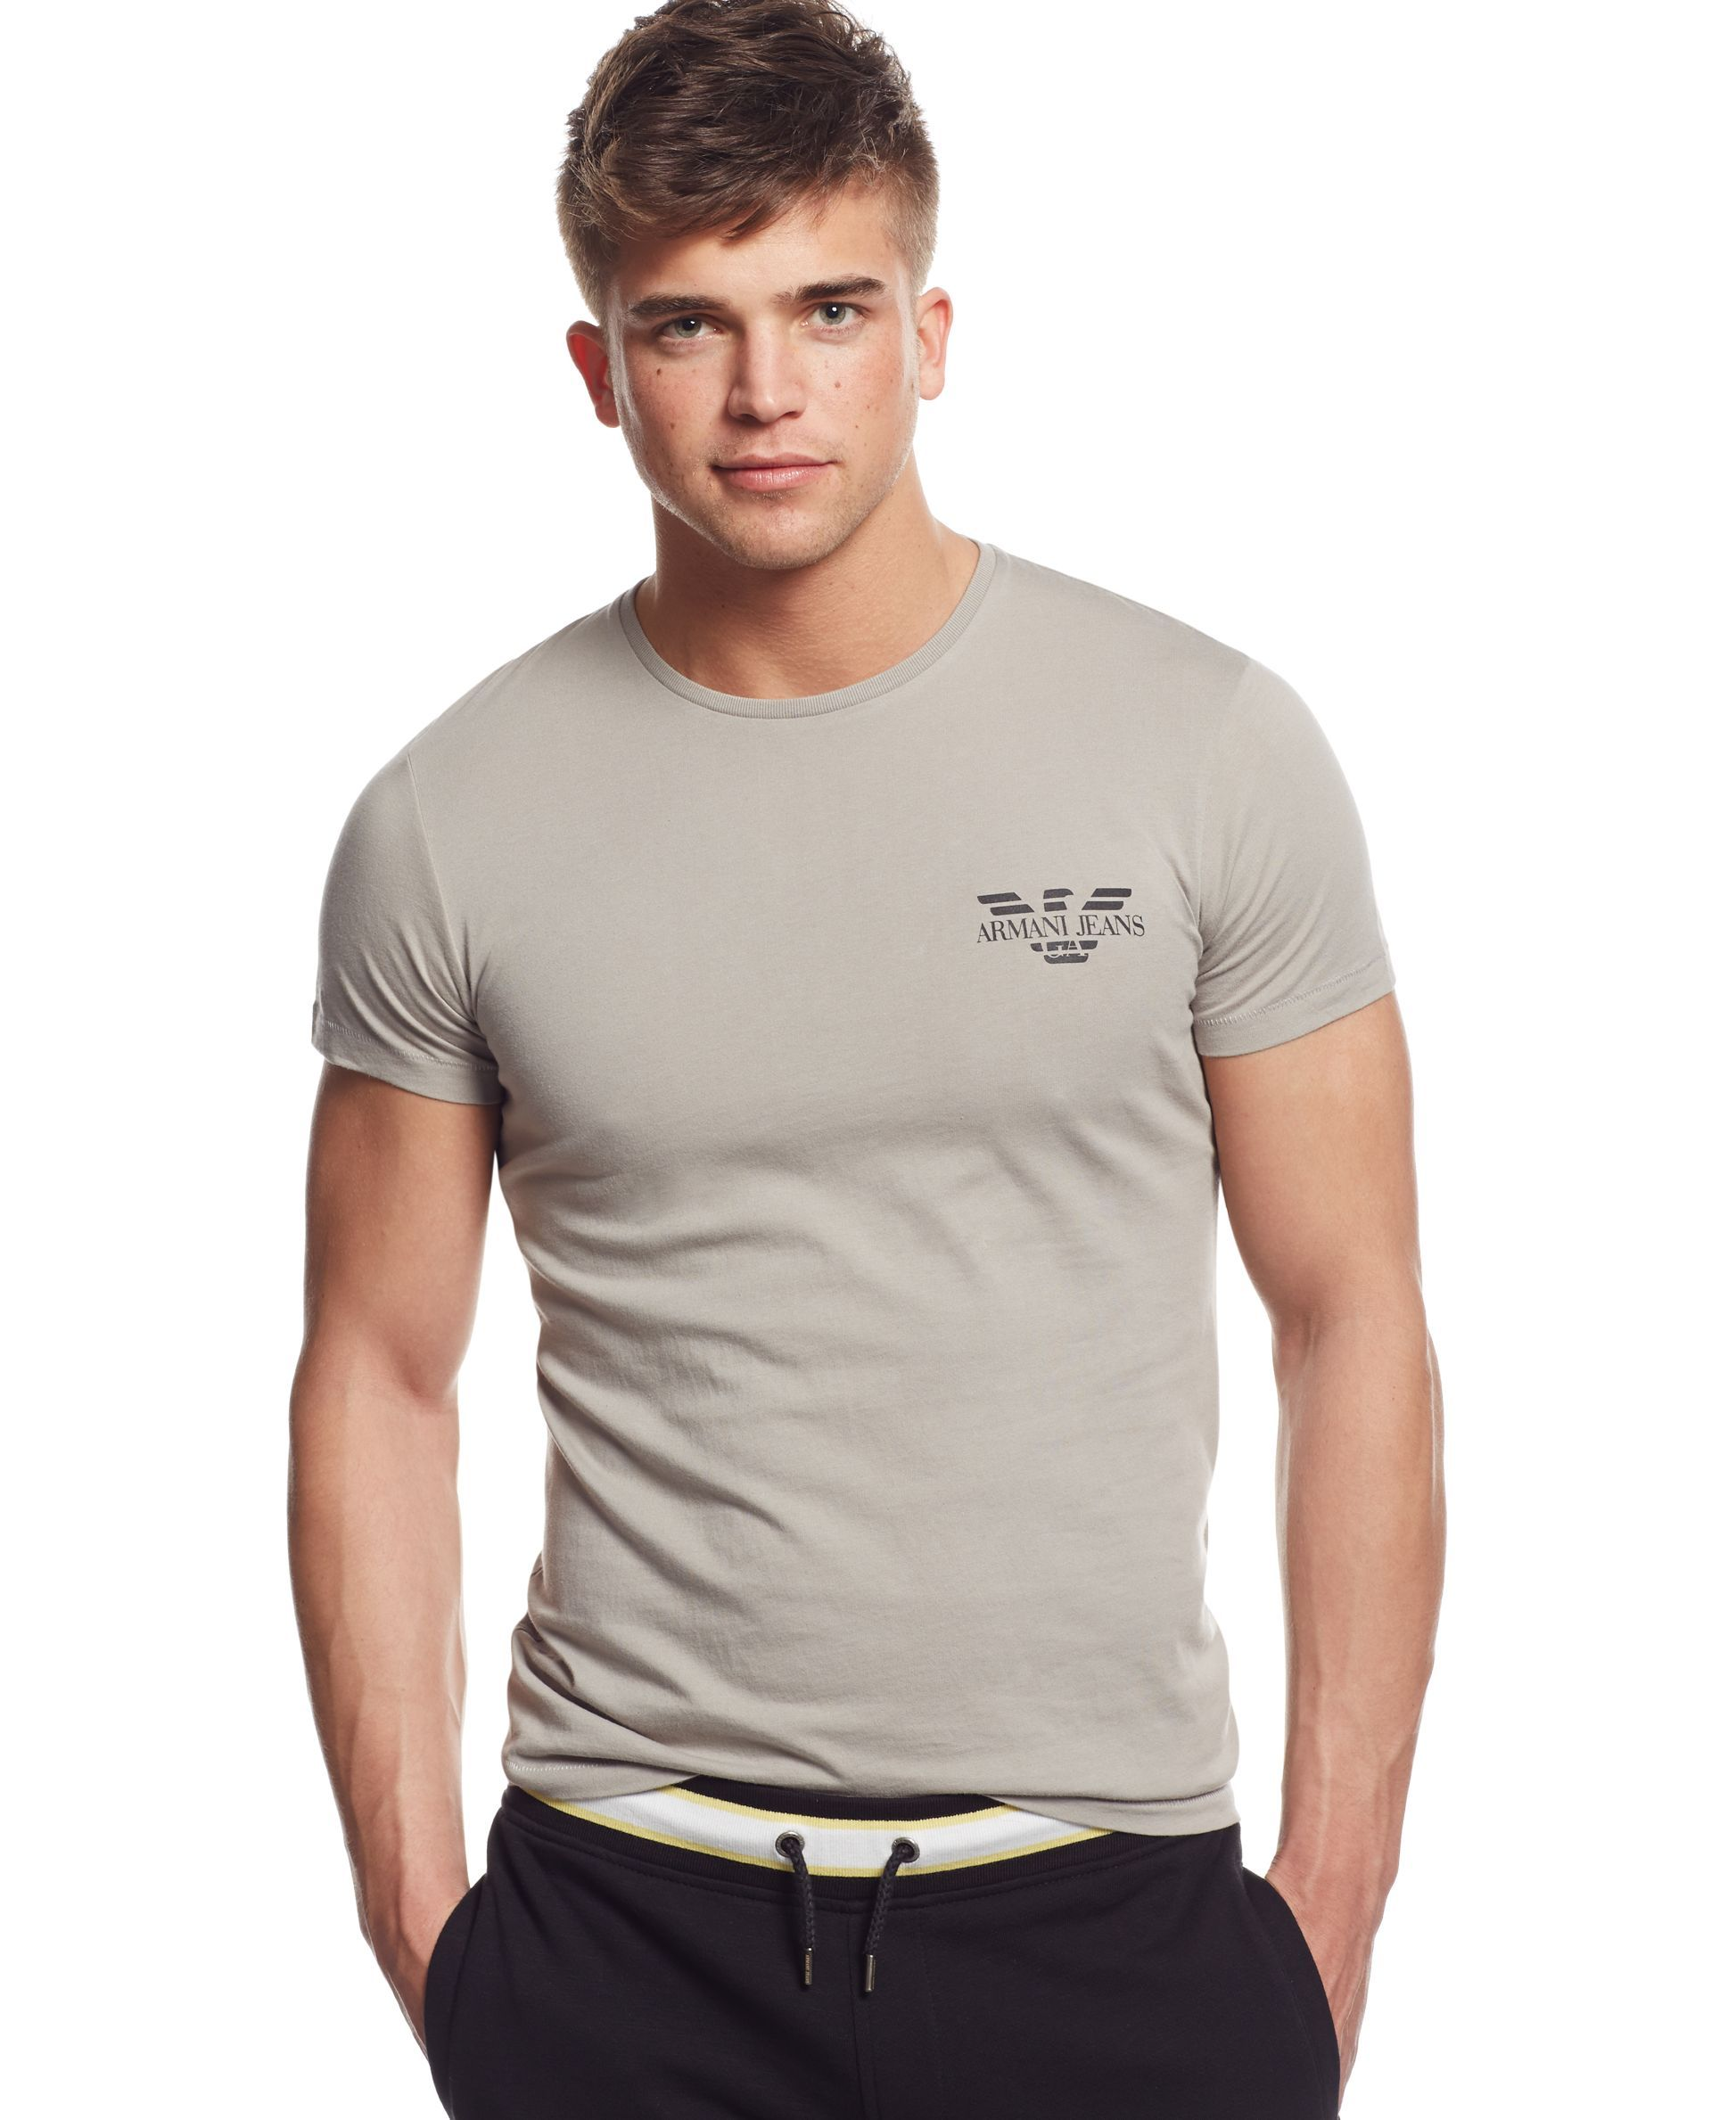 ae20909b Armani Jeans Mens Tipped Short Sleeve Polo Shirt - raveitsafe